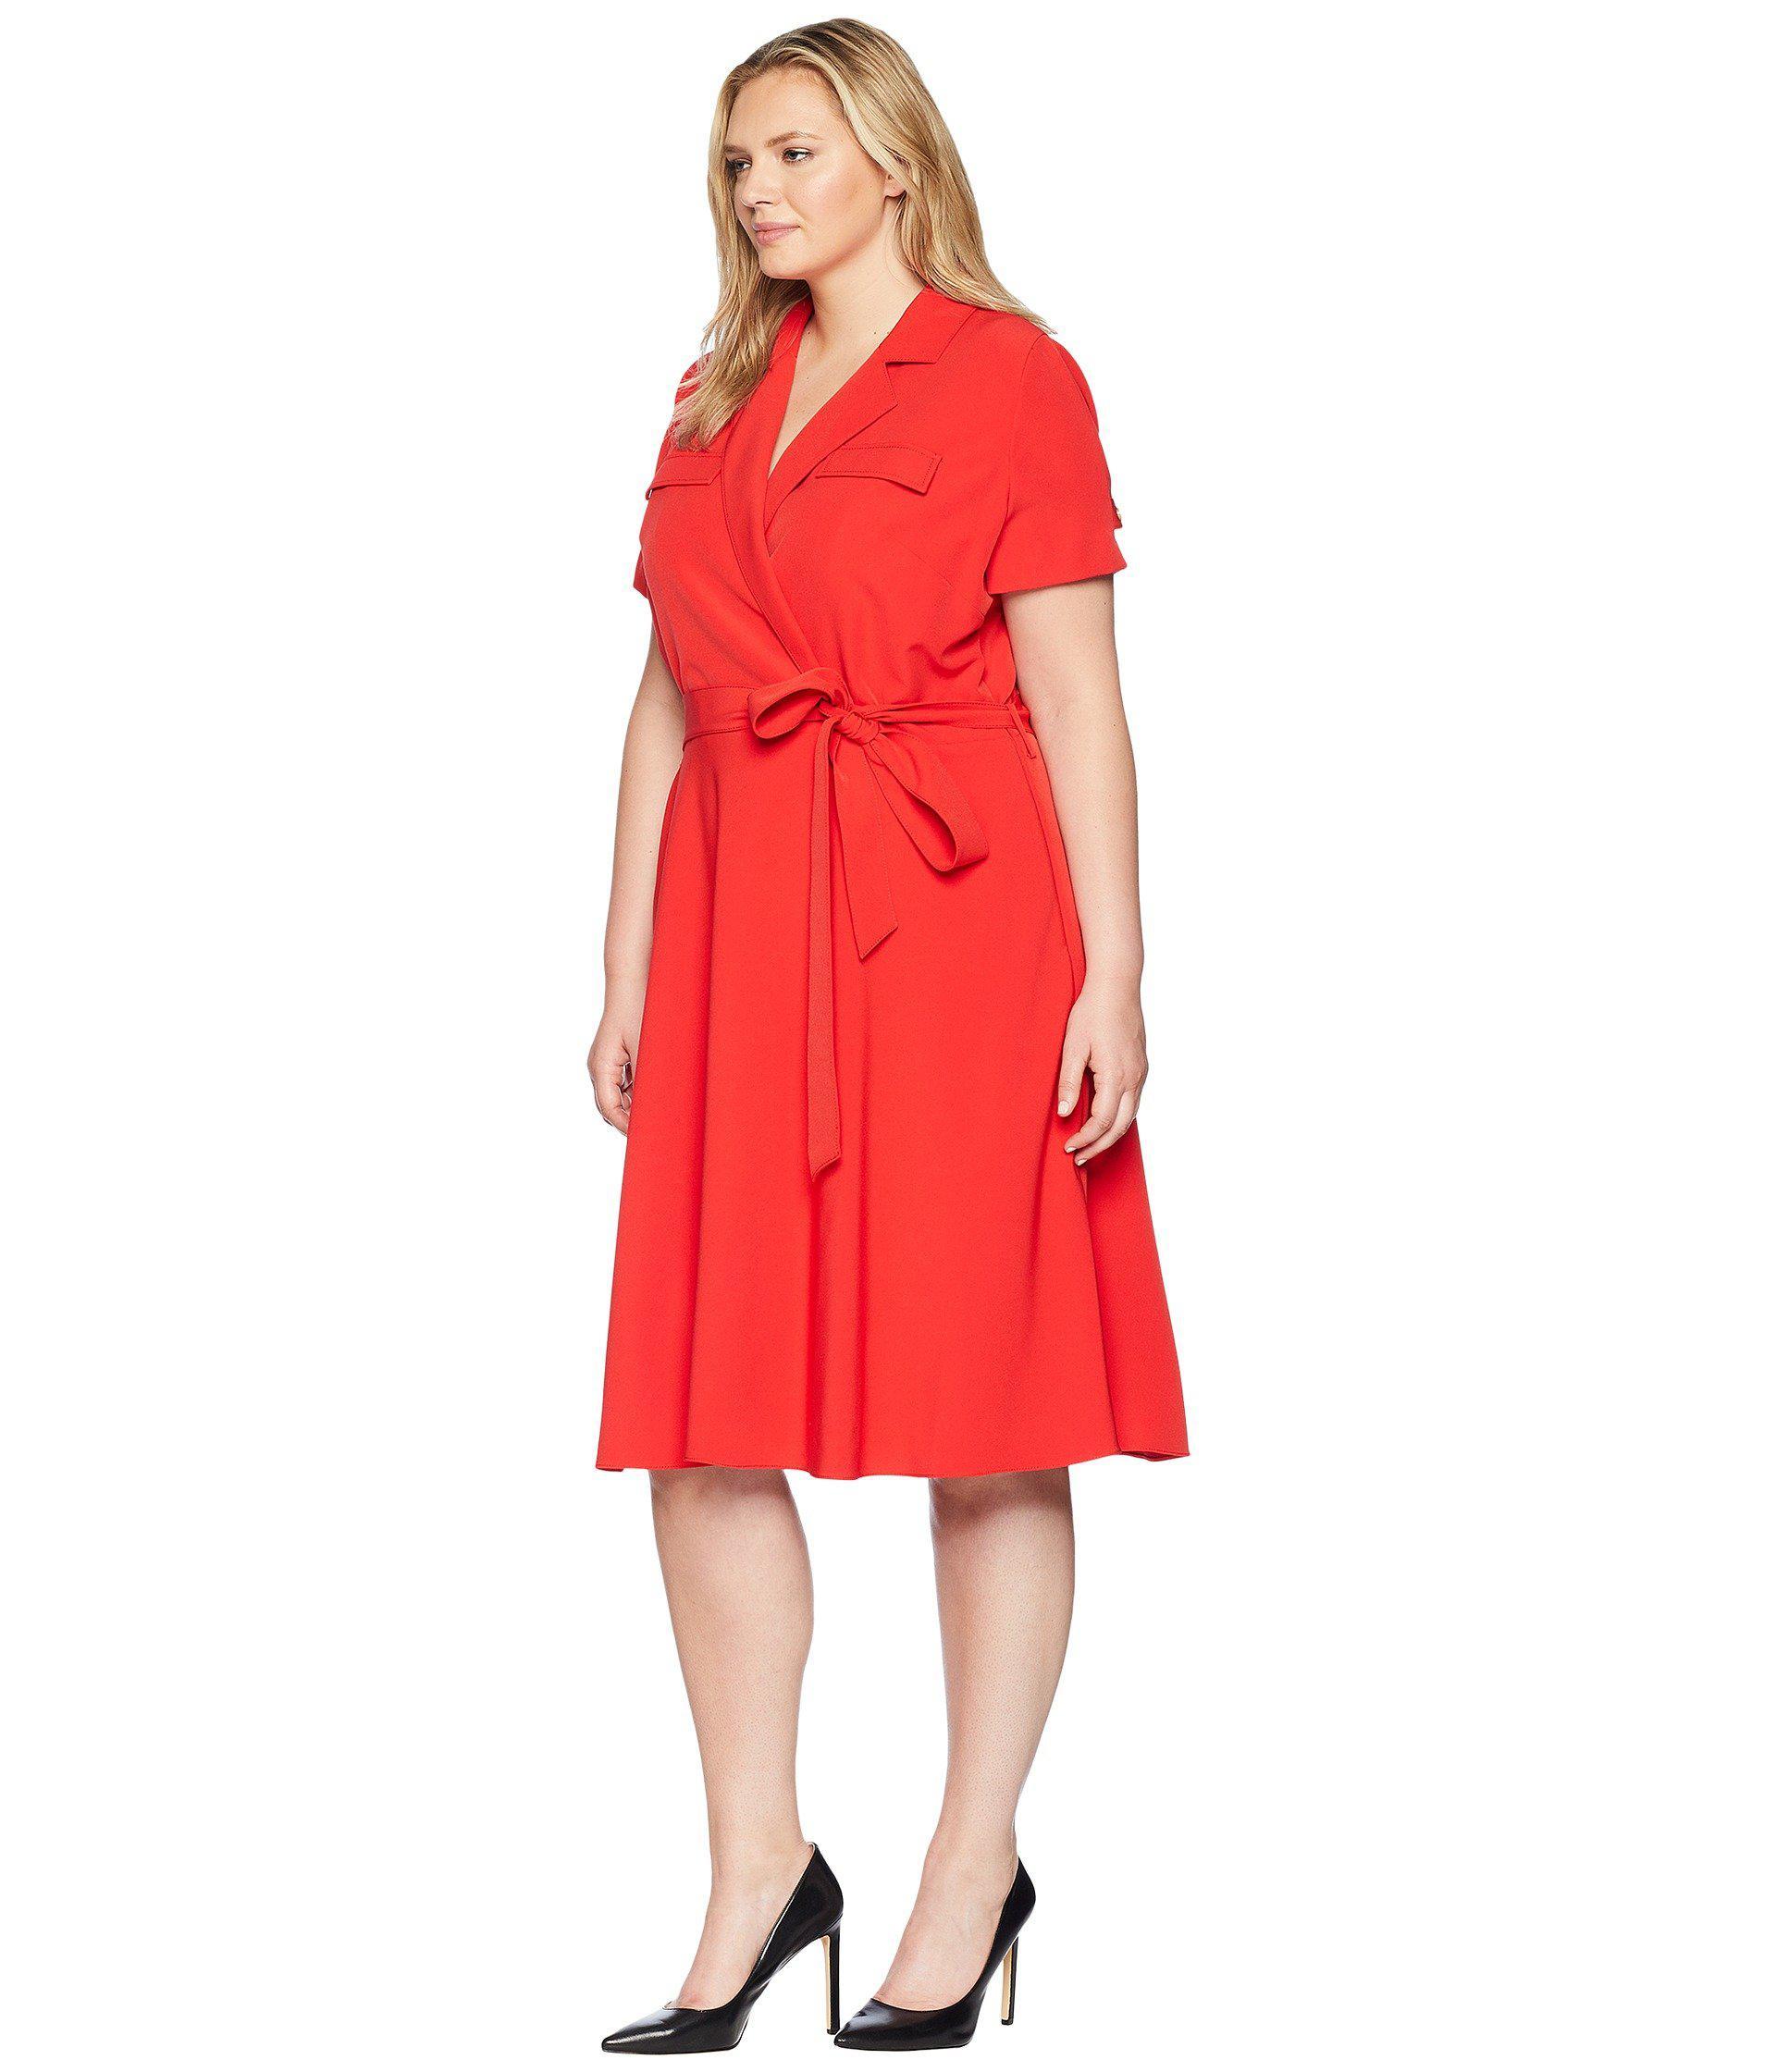 659fc9a03b8f Lyst - Tahari Plus Size Crepe Shirtdress in Red - Save 22%